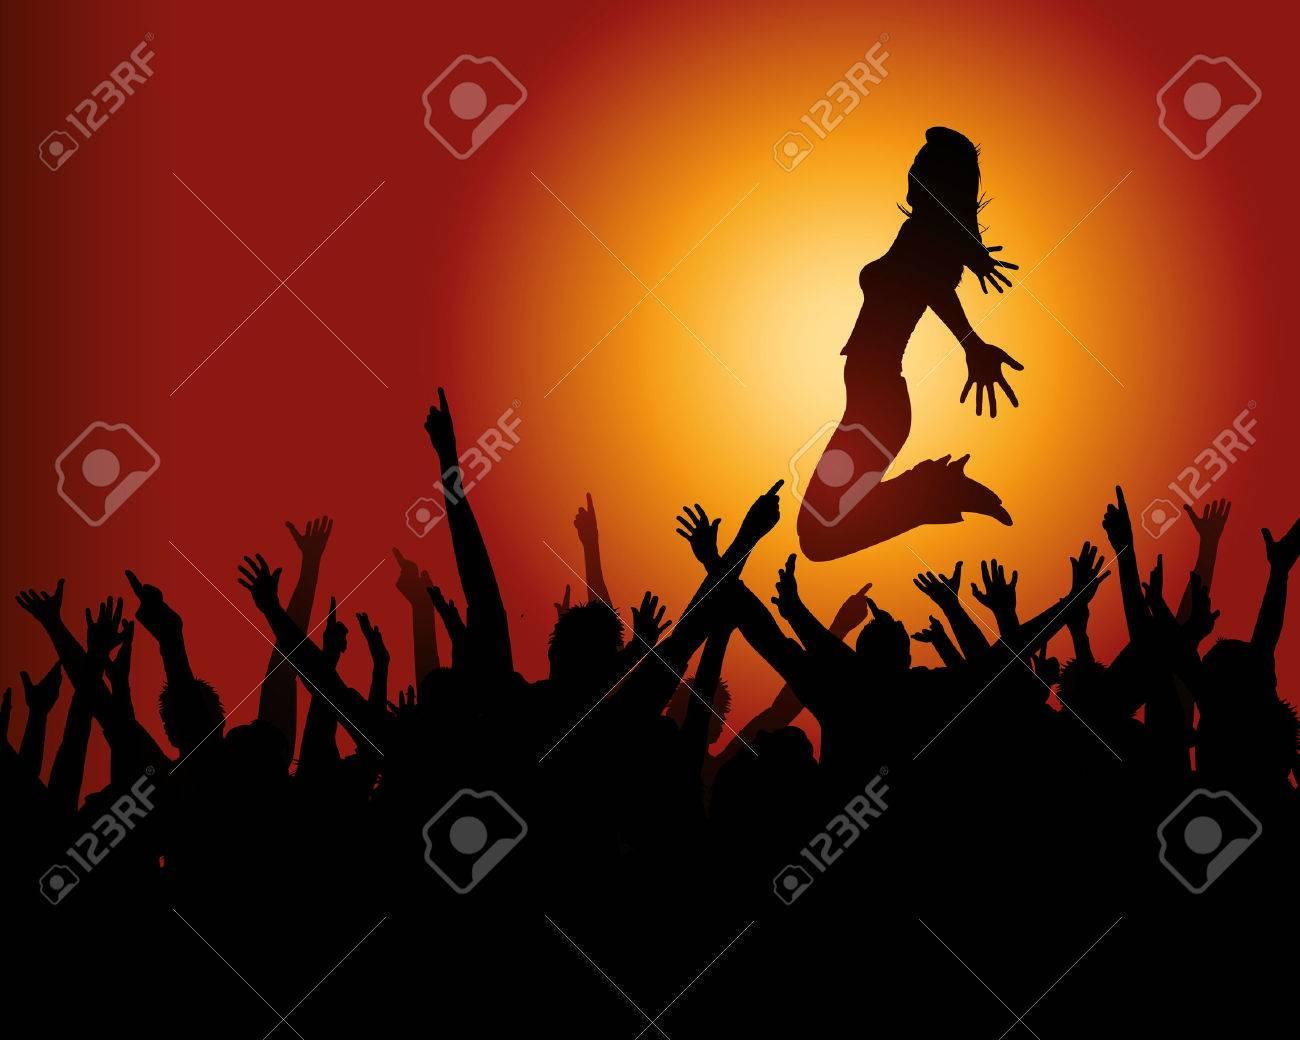 Jubilant Crowd Star And Jubilant Crowd Free